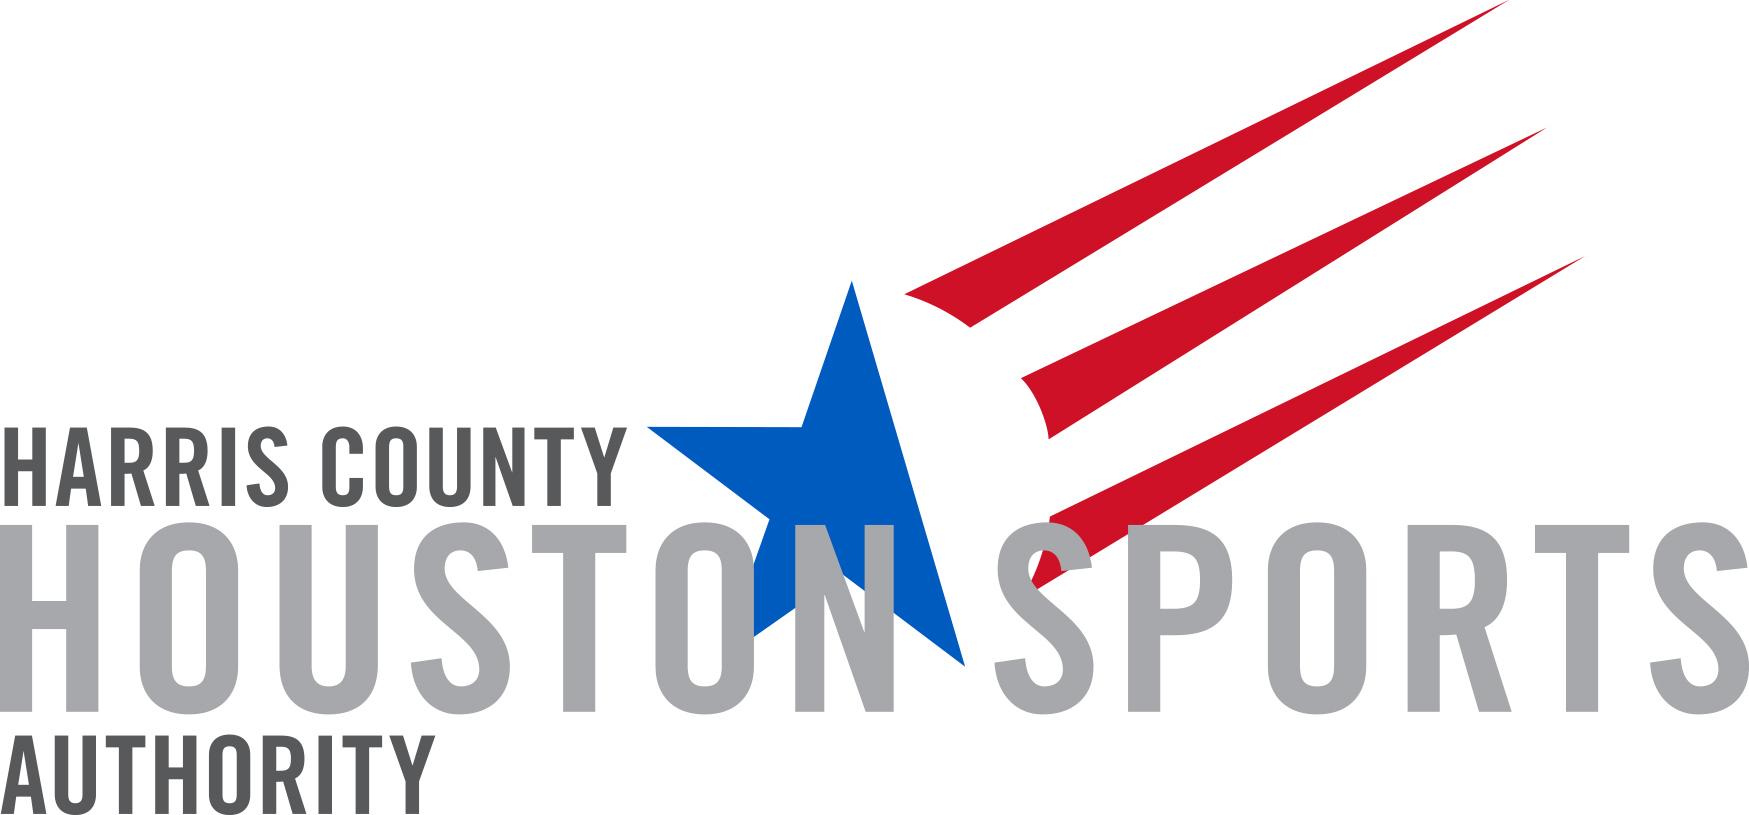 HarrisCountyHouston_Logo.jpg